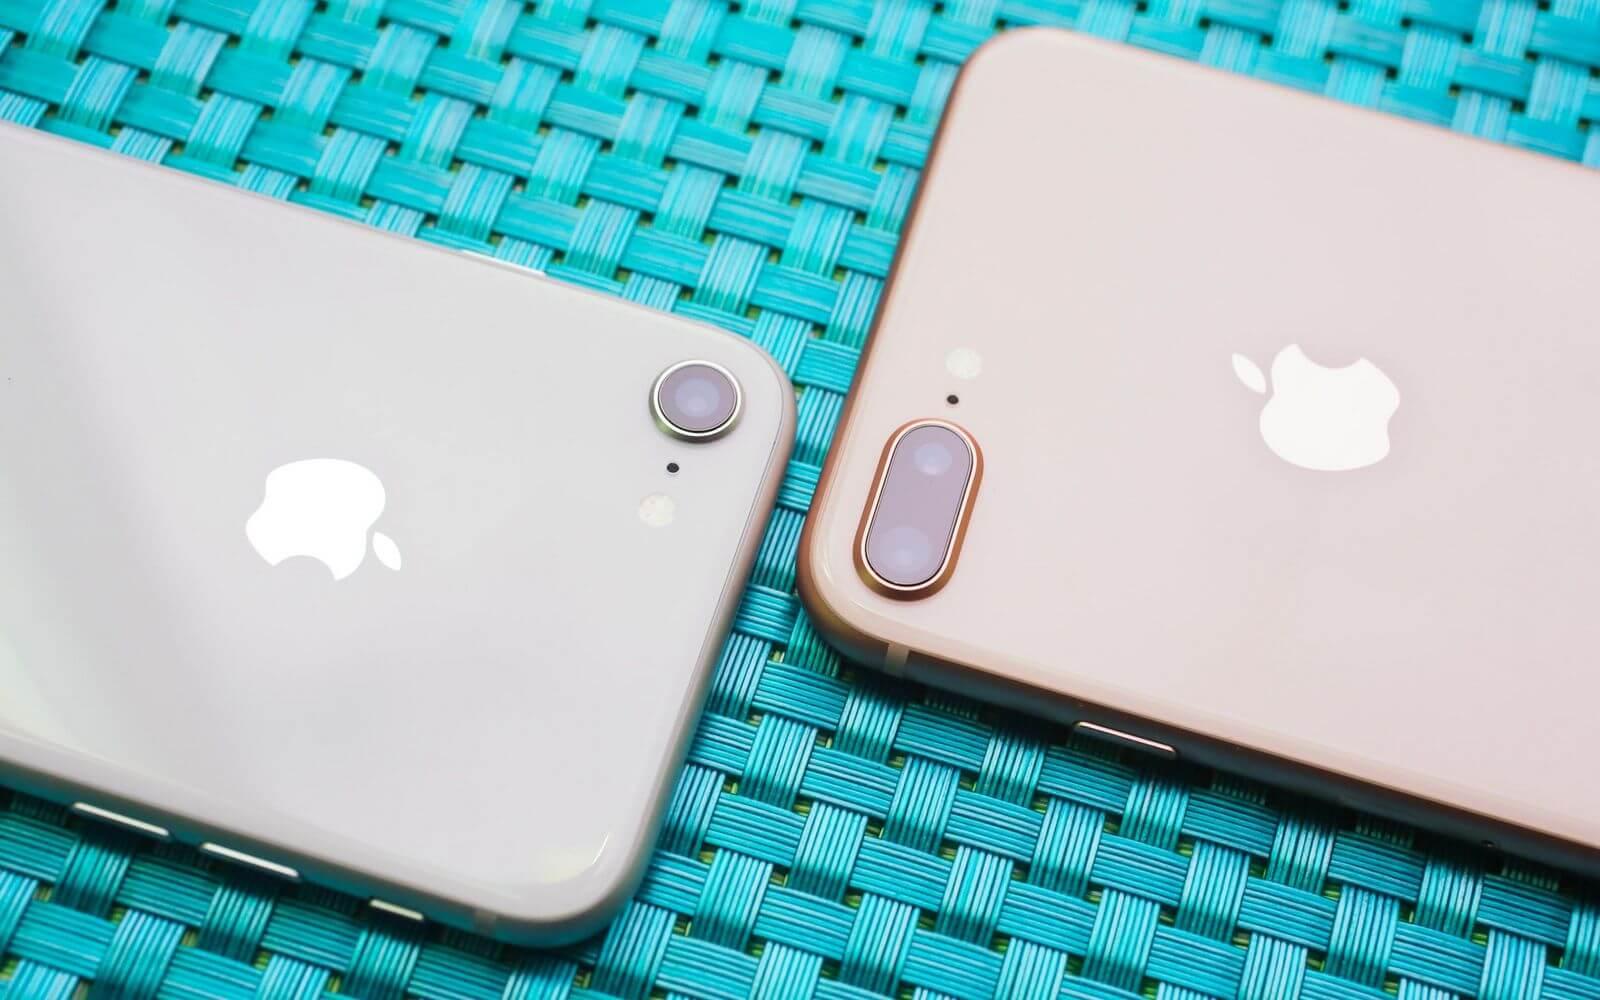 iPhone 8 и iPhone 8 Plus могут подорожать к Новому году